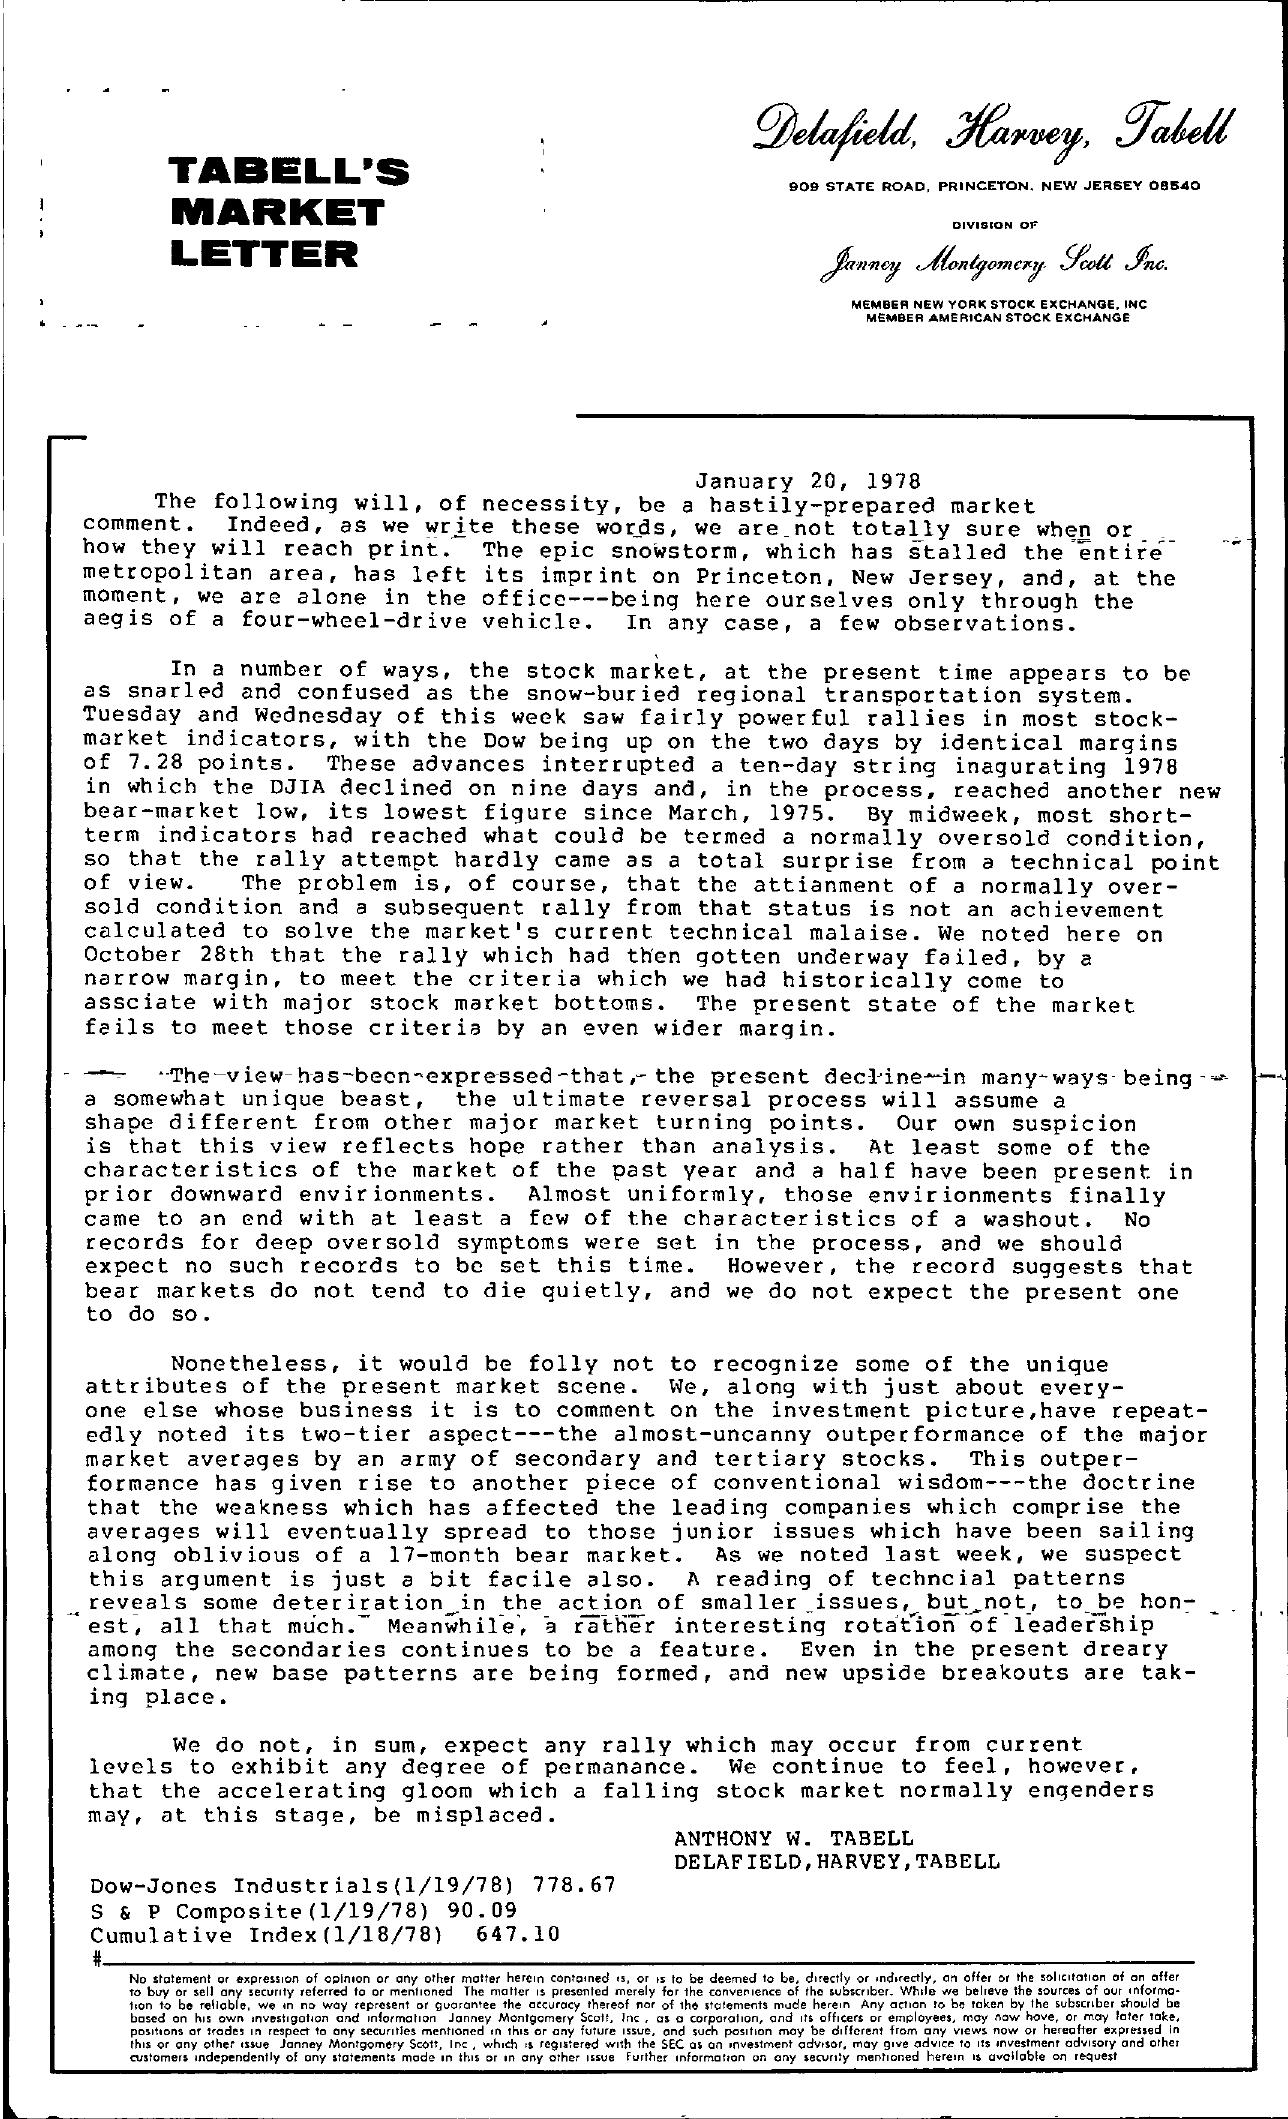 Tabell's Market Letter - January 20, 1978